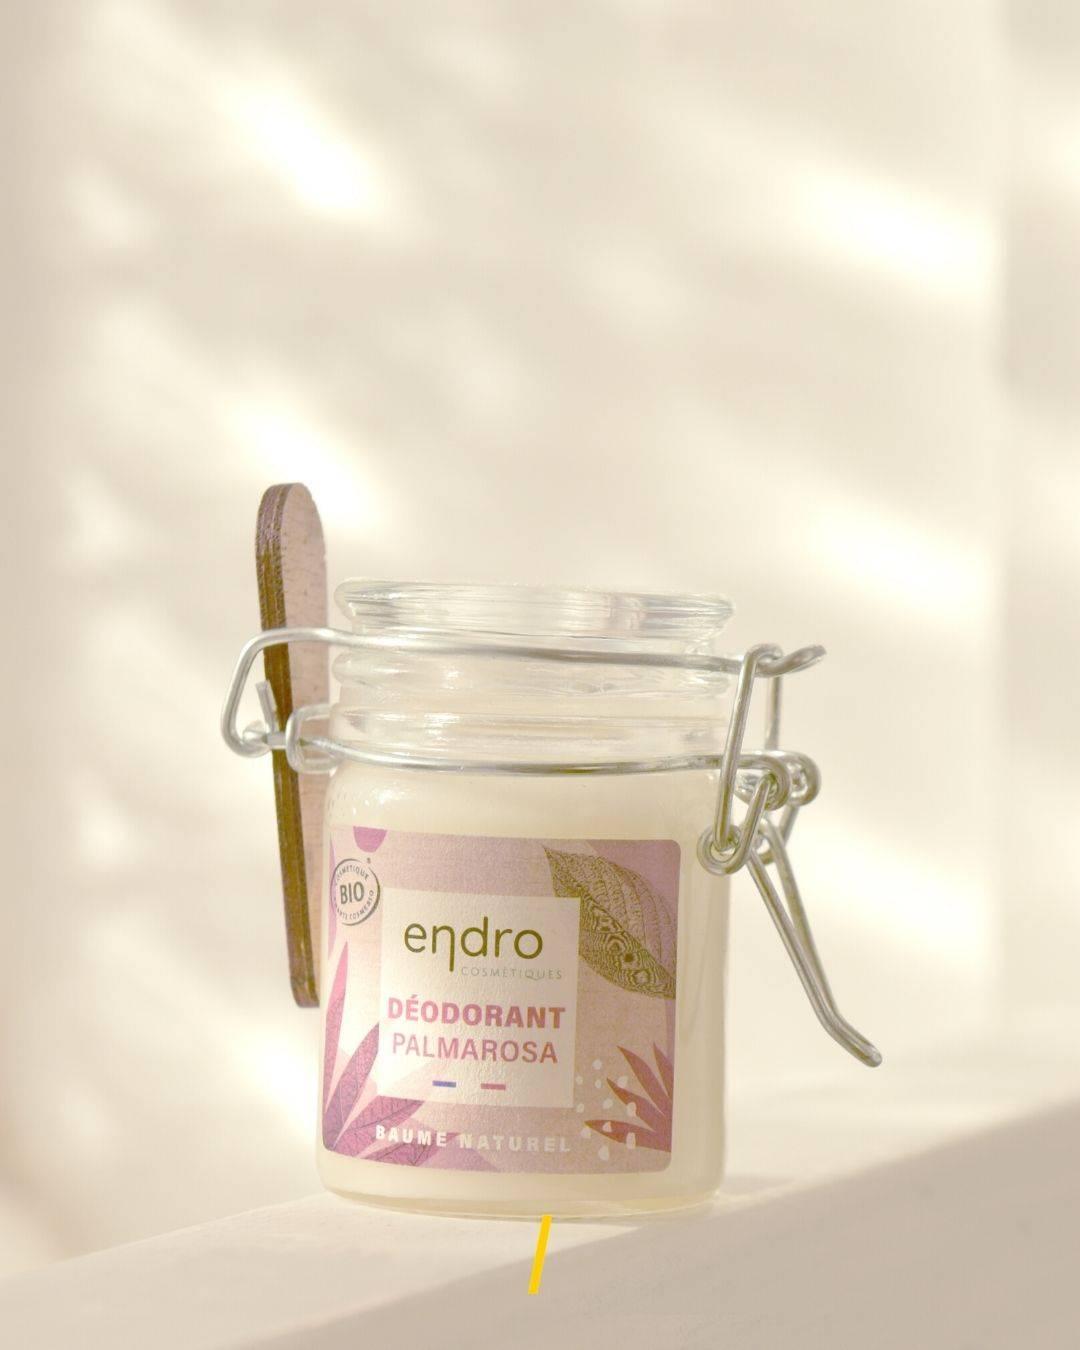 Le déodorant baume - Palmarosa - Endro